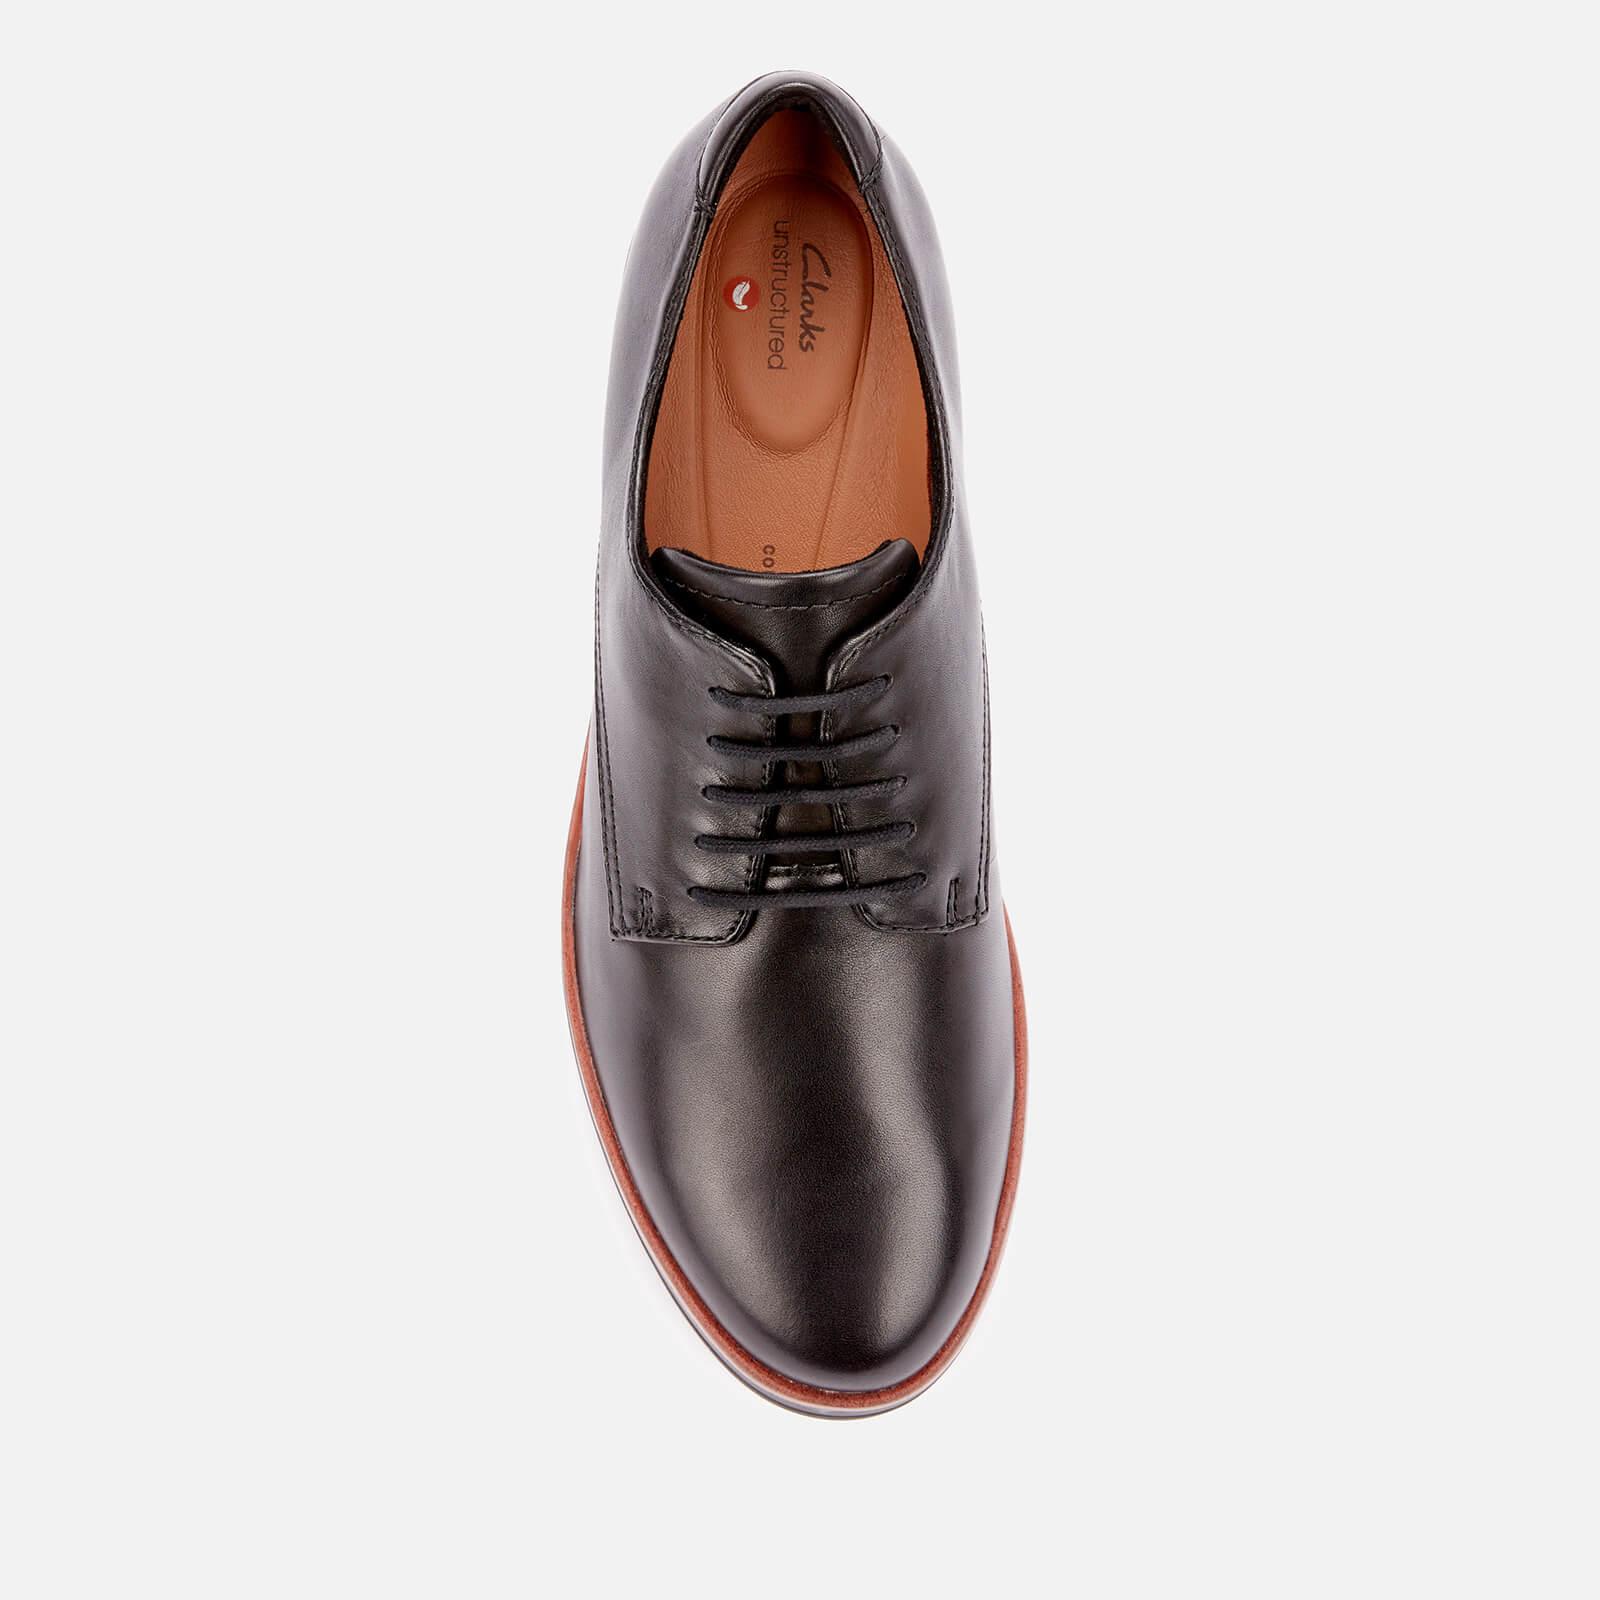 Clarks Women's Shaylin Lace Leather Shoes - Black - Uk 3